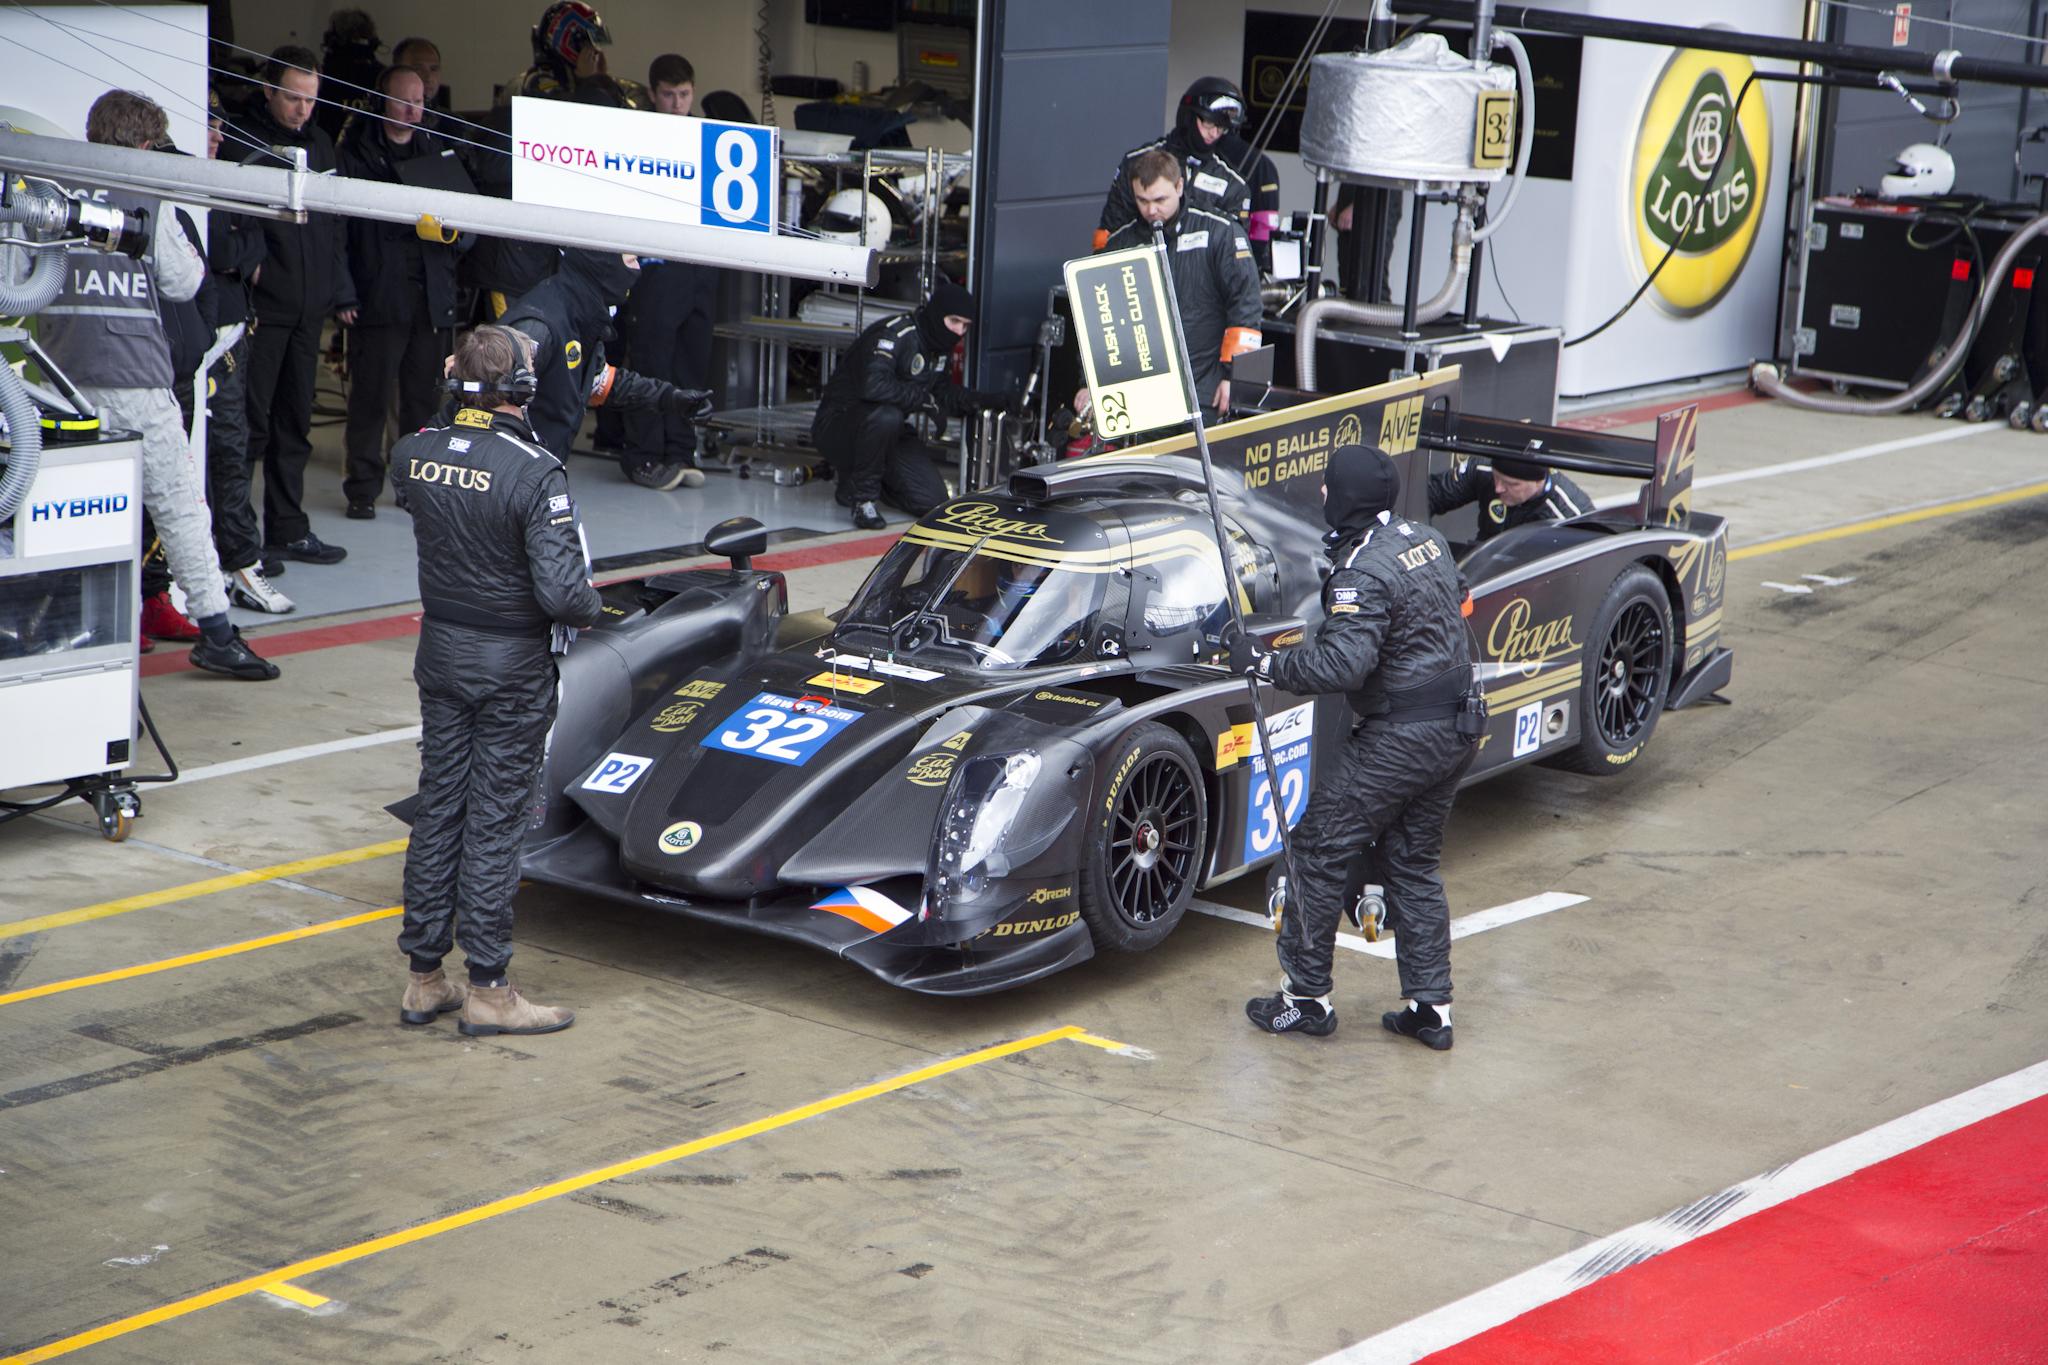 Praga Partners with Lotus for World Endurance Championship